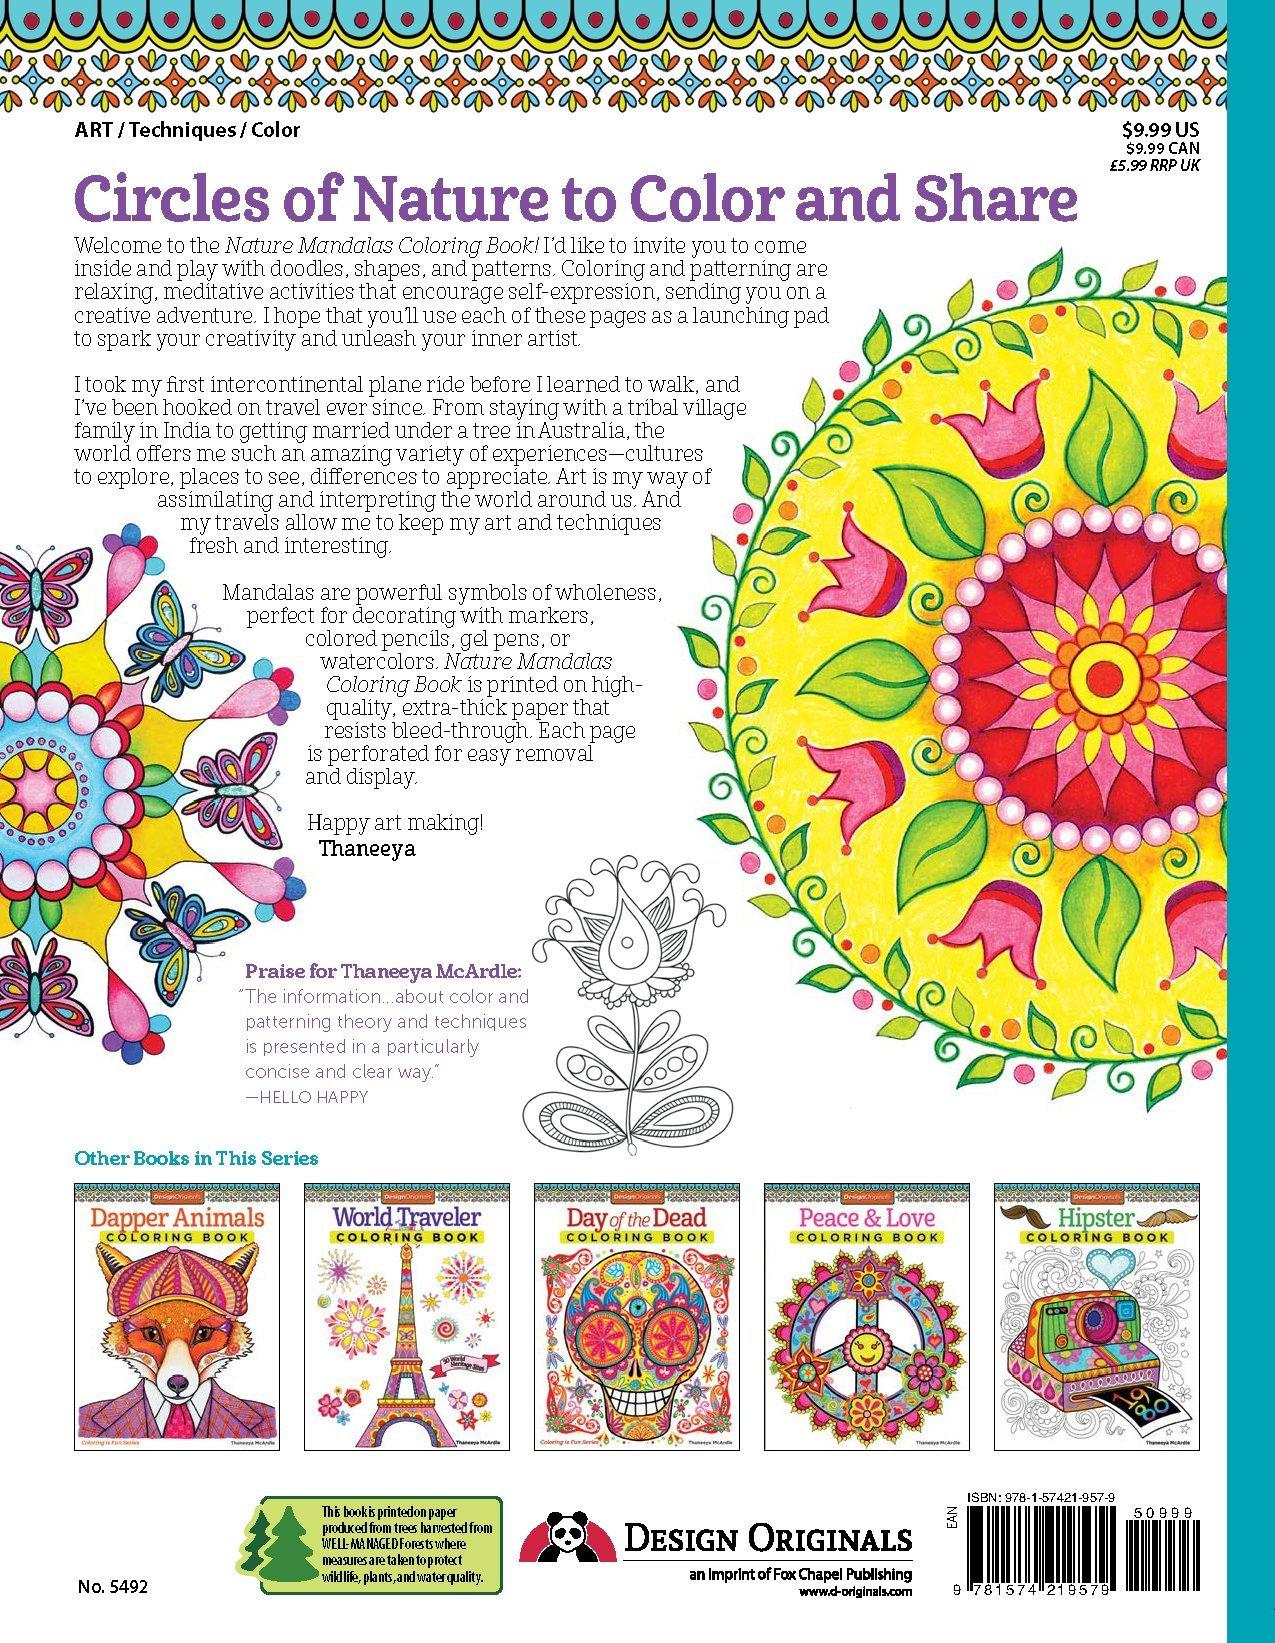 Nature Mandalas Coloring Book Design Originals Thaneeya Mcardle 9781574219579 Amazoncom Books